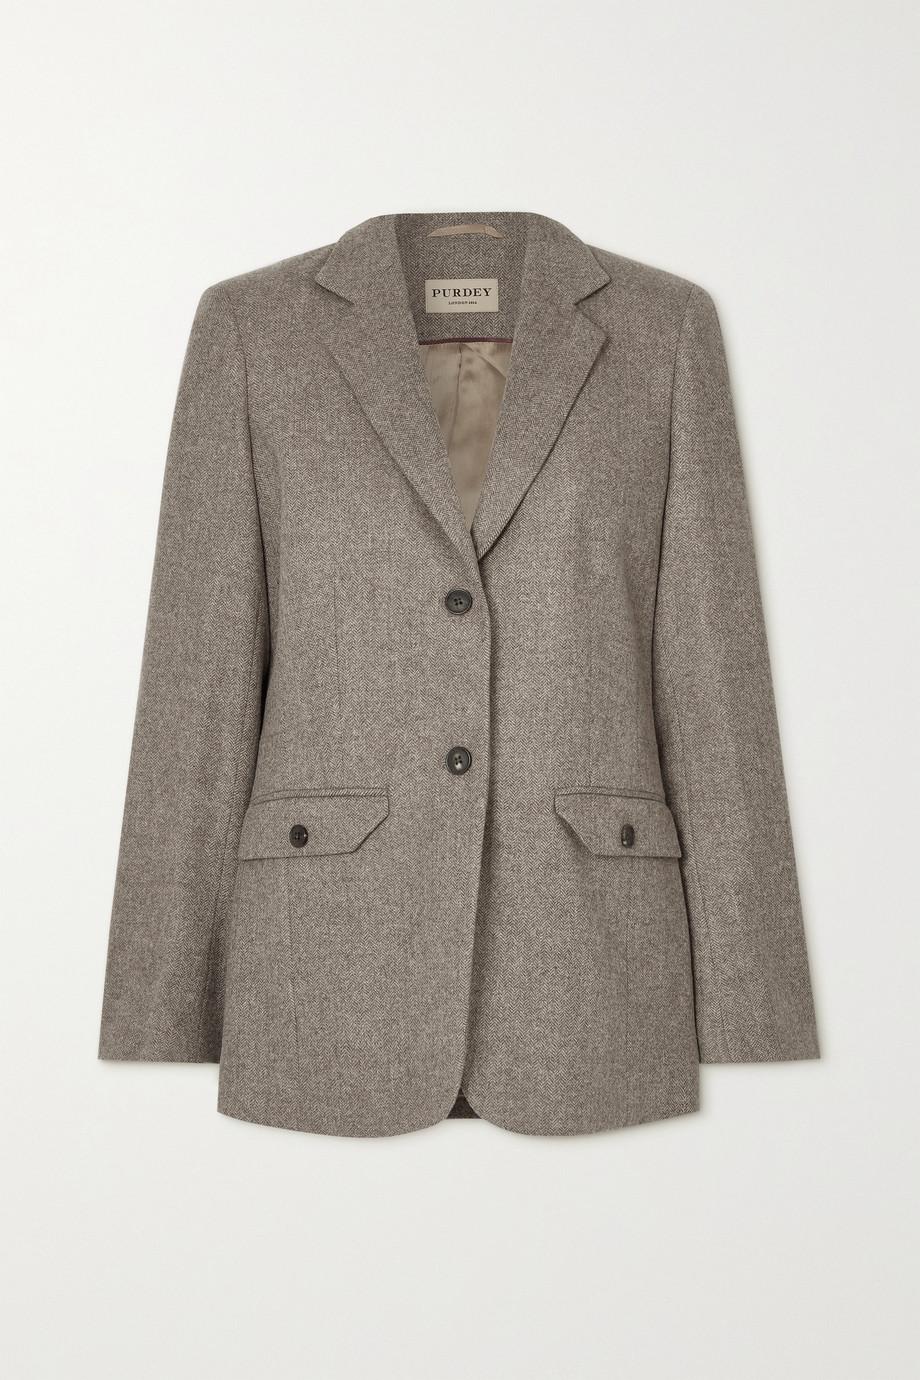 Purdey Herringbone wool blazer